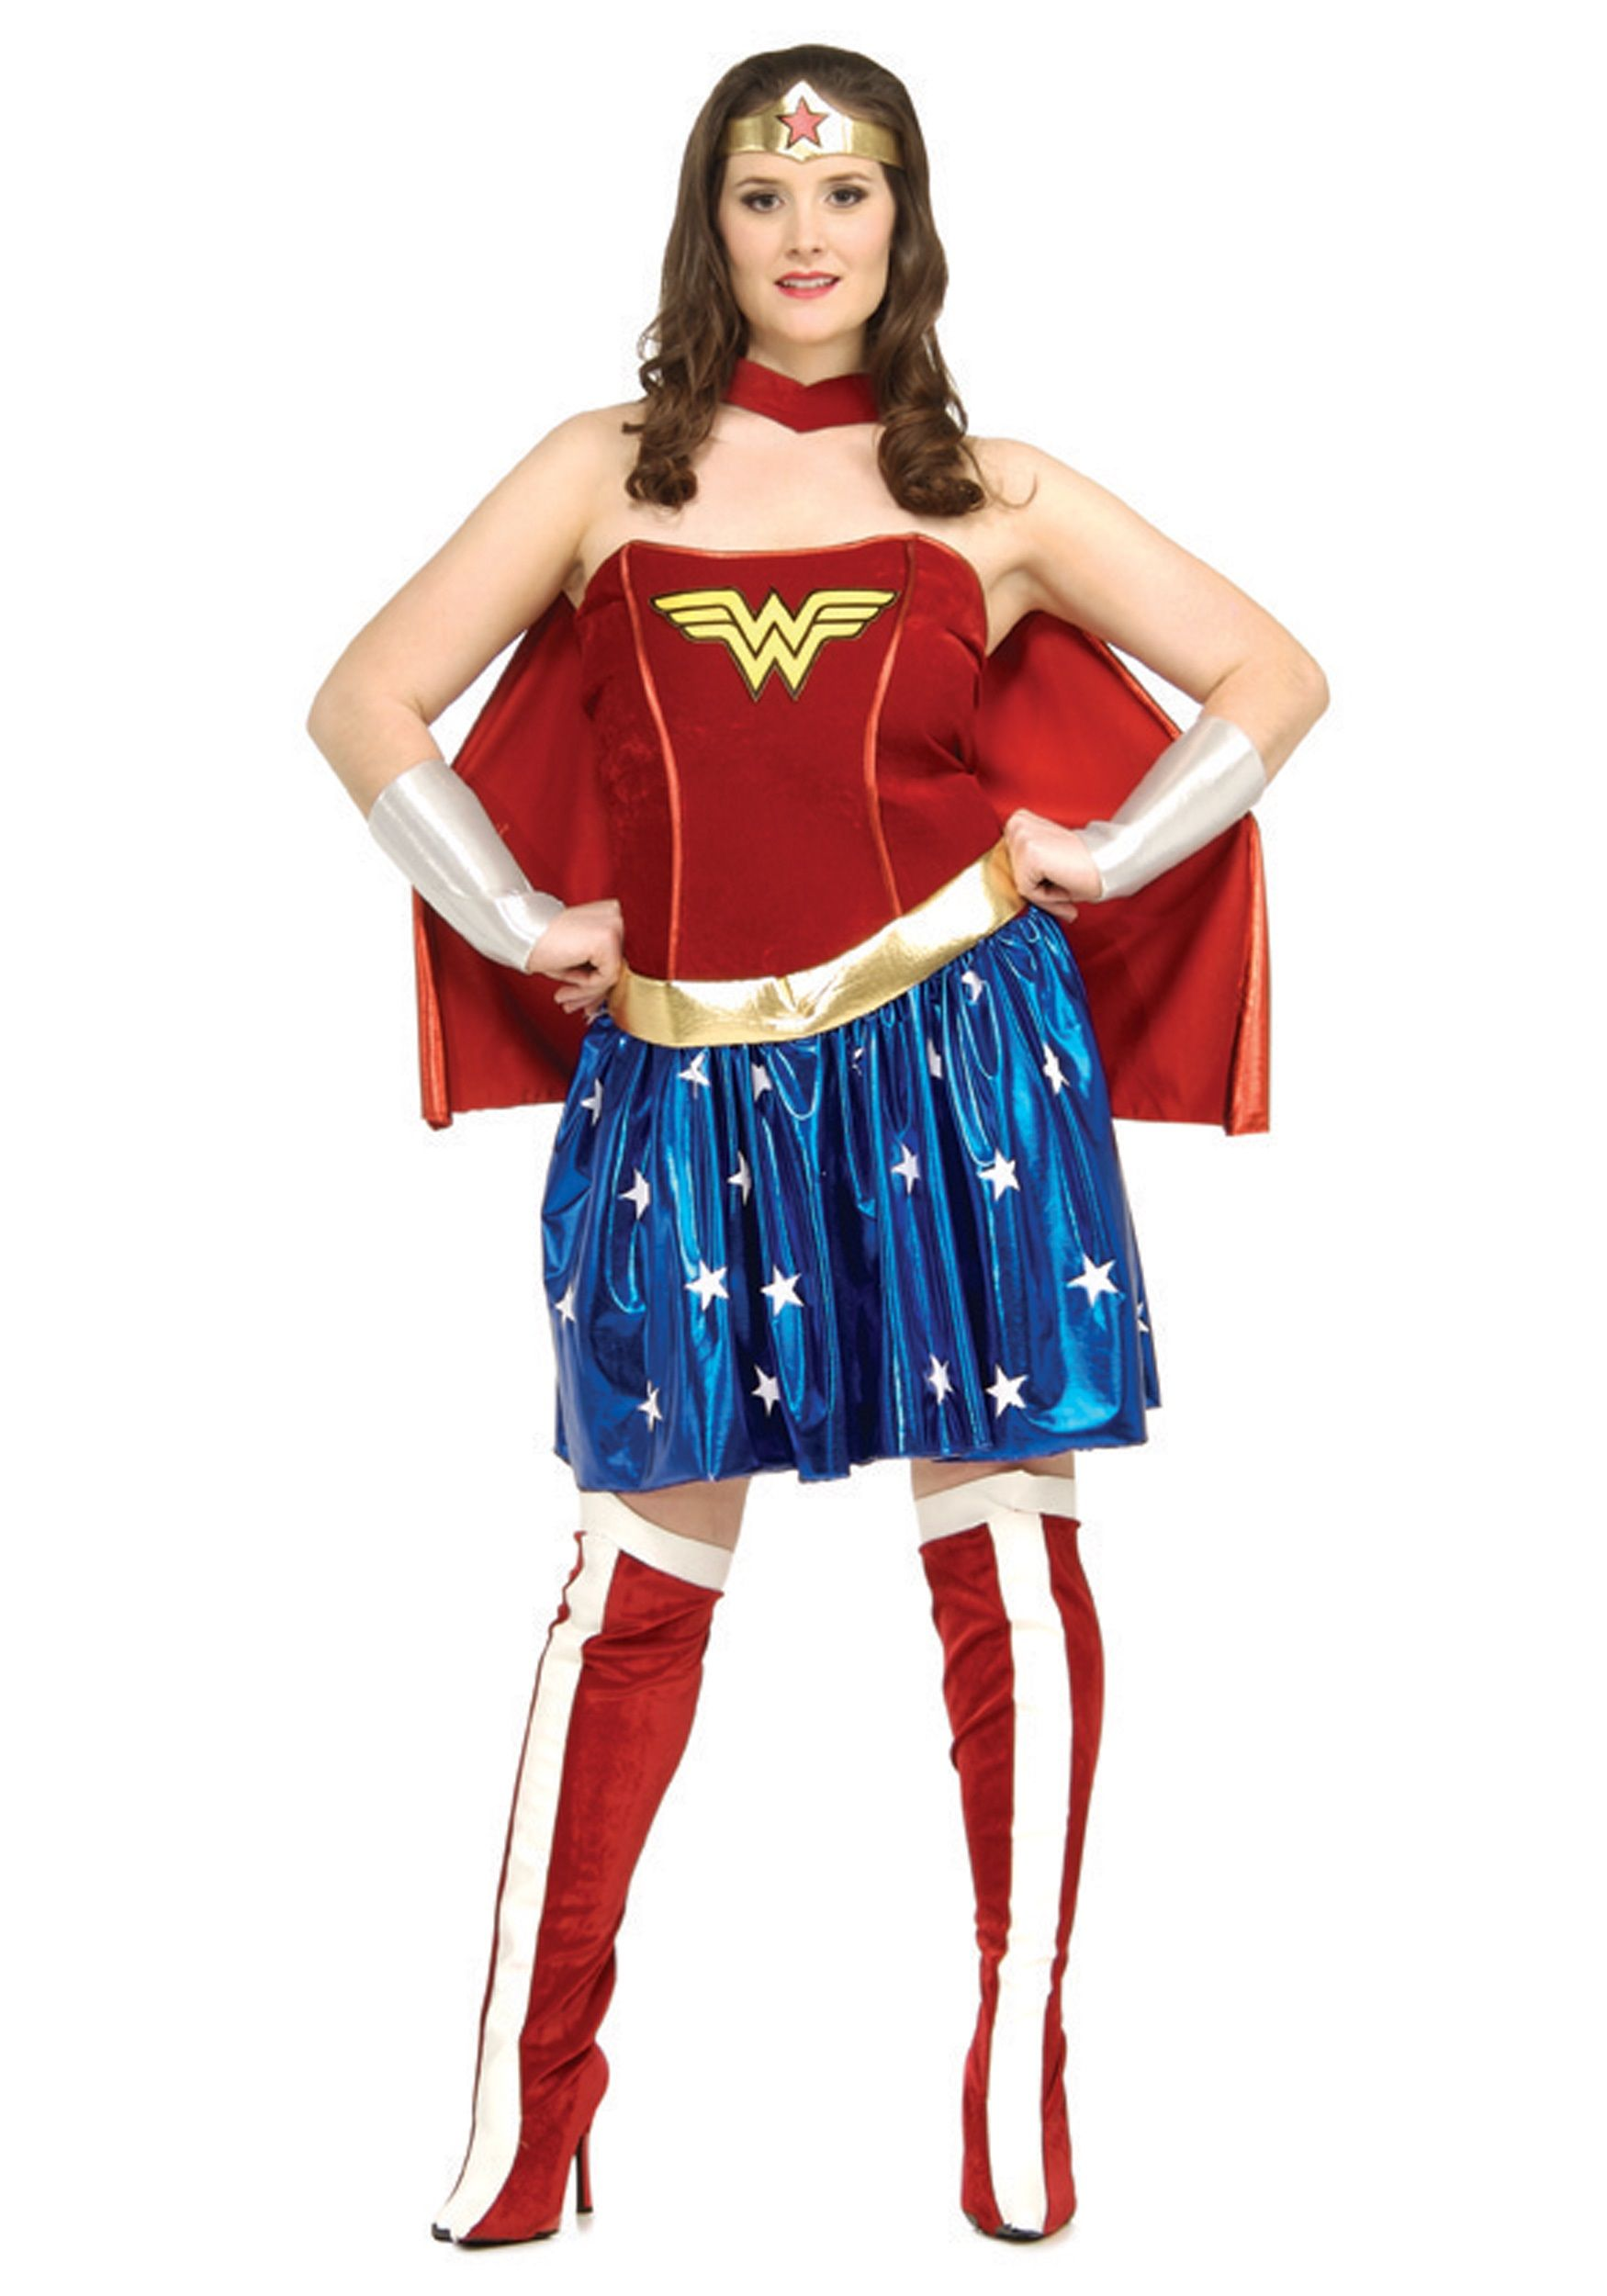 captain america costume | Wonder Woman Plus Size Costume - Wonder Woman Costume Adult